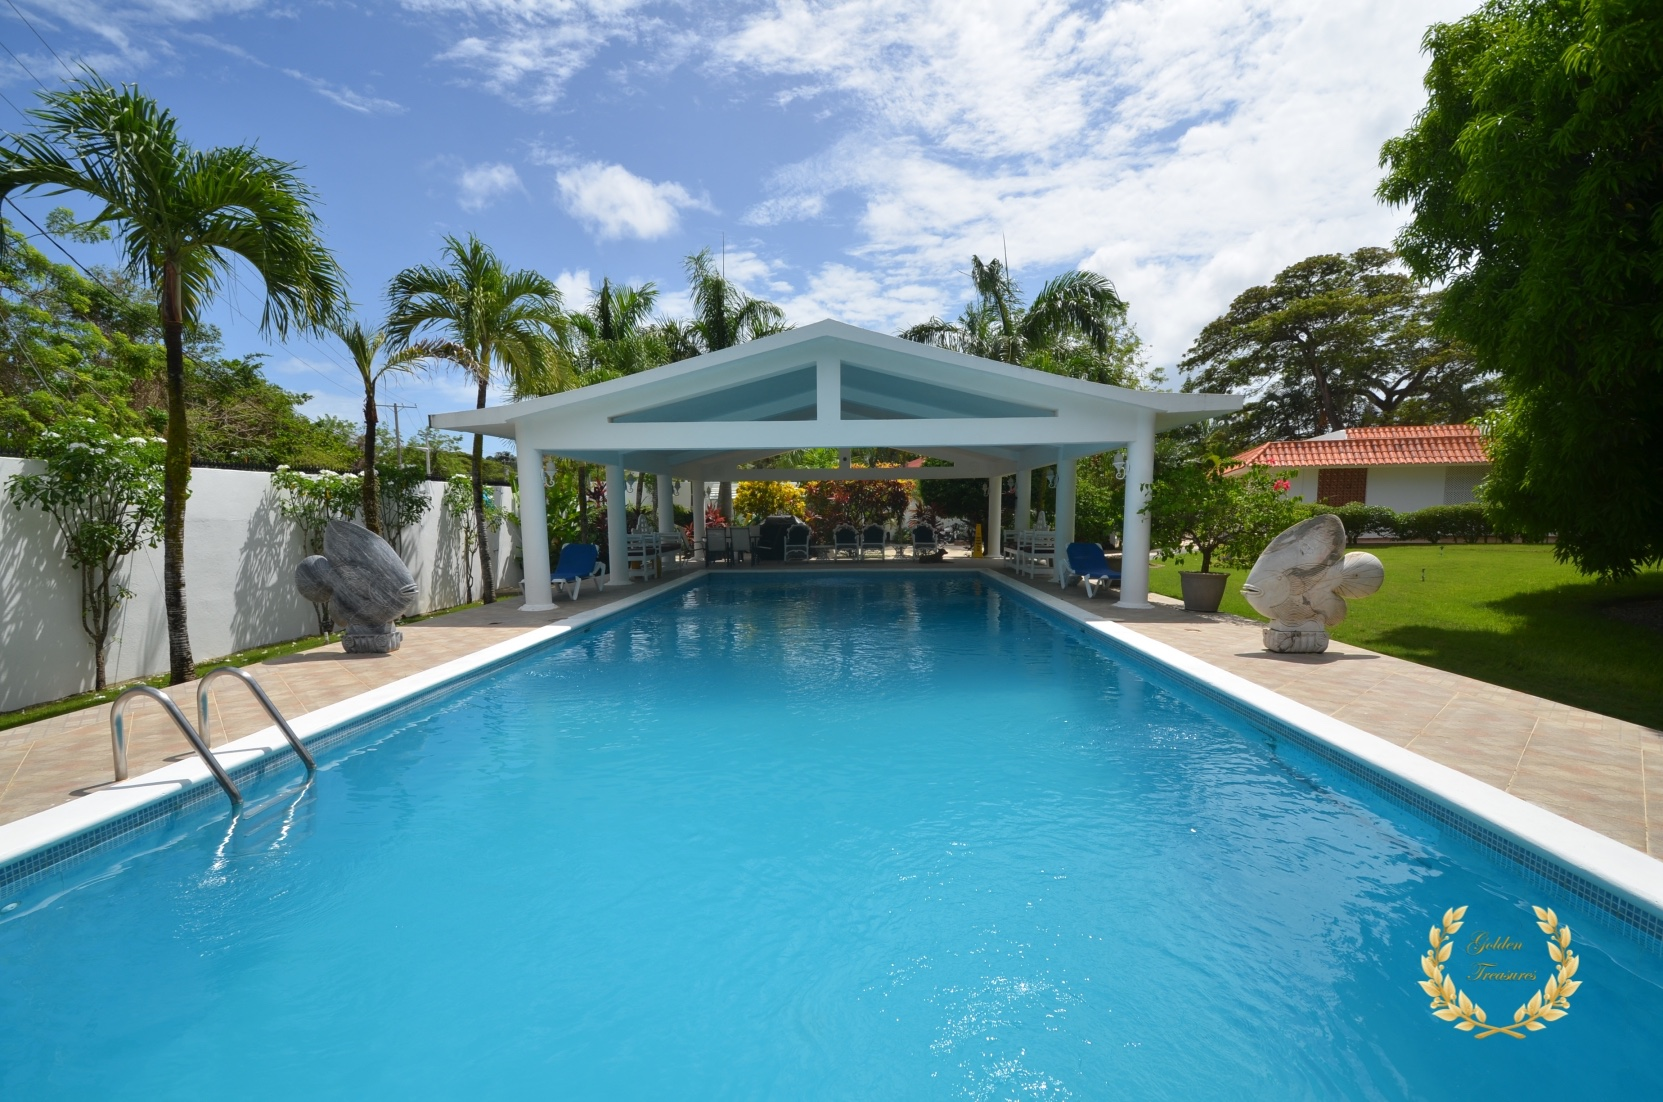 2 Bedroom Villa Rental in Sosua with Lap Pool